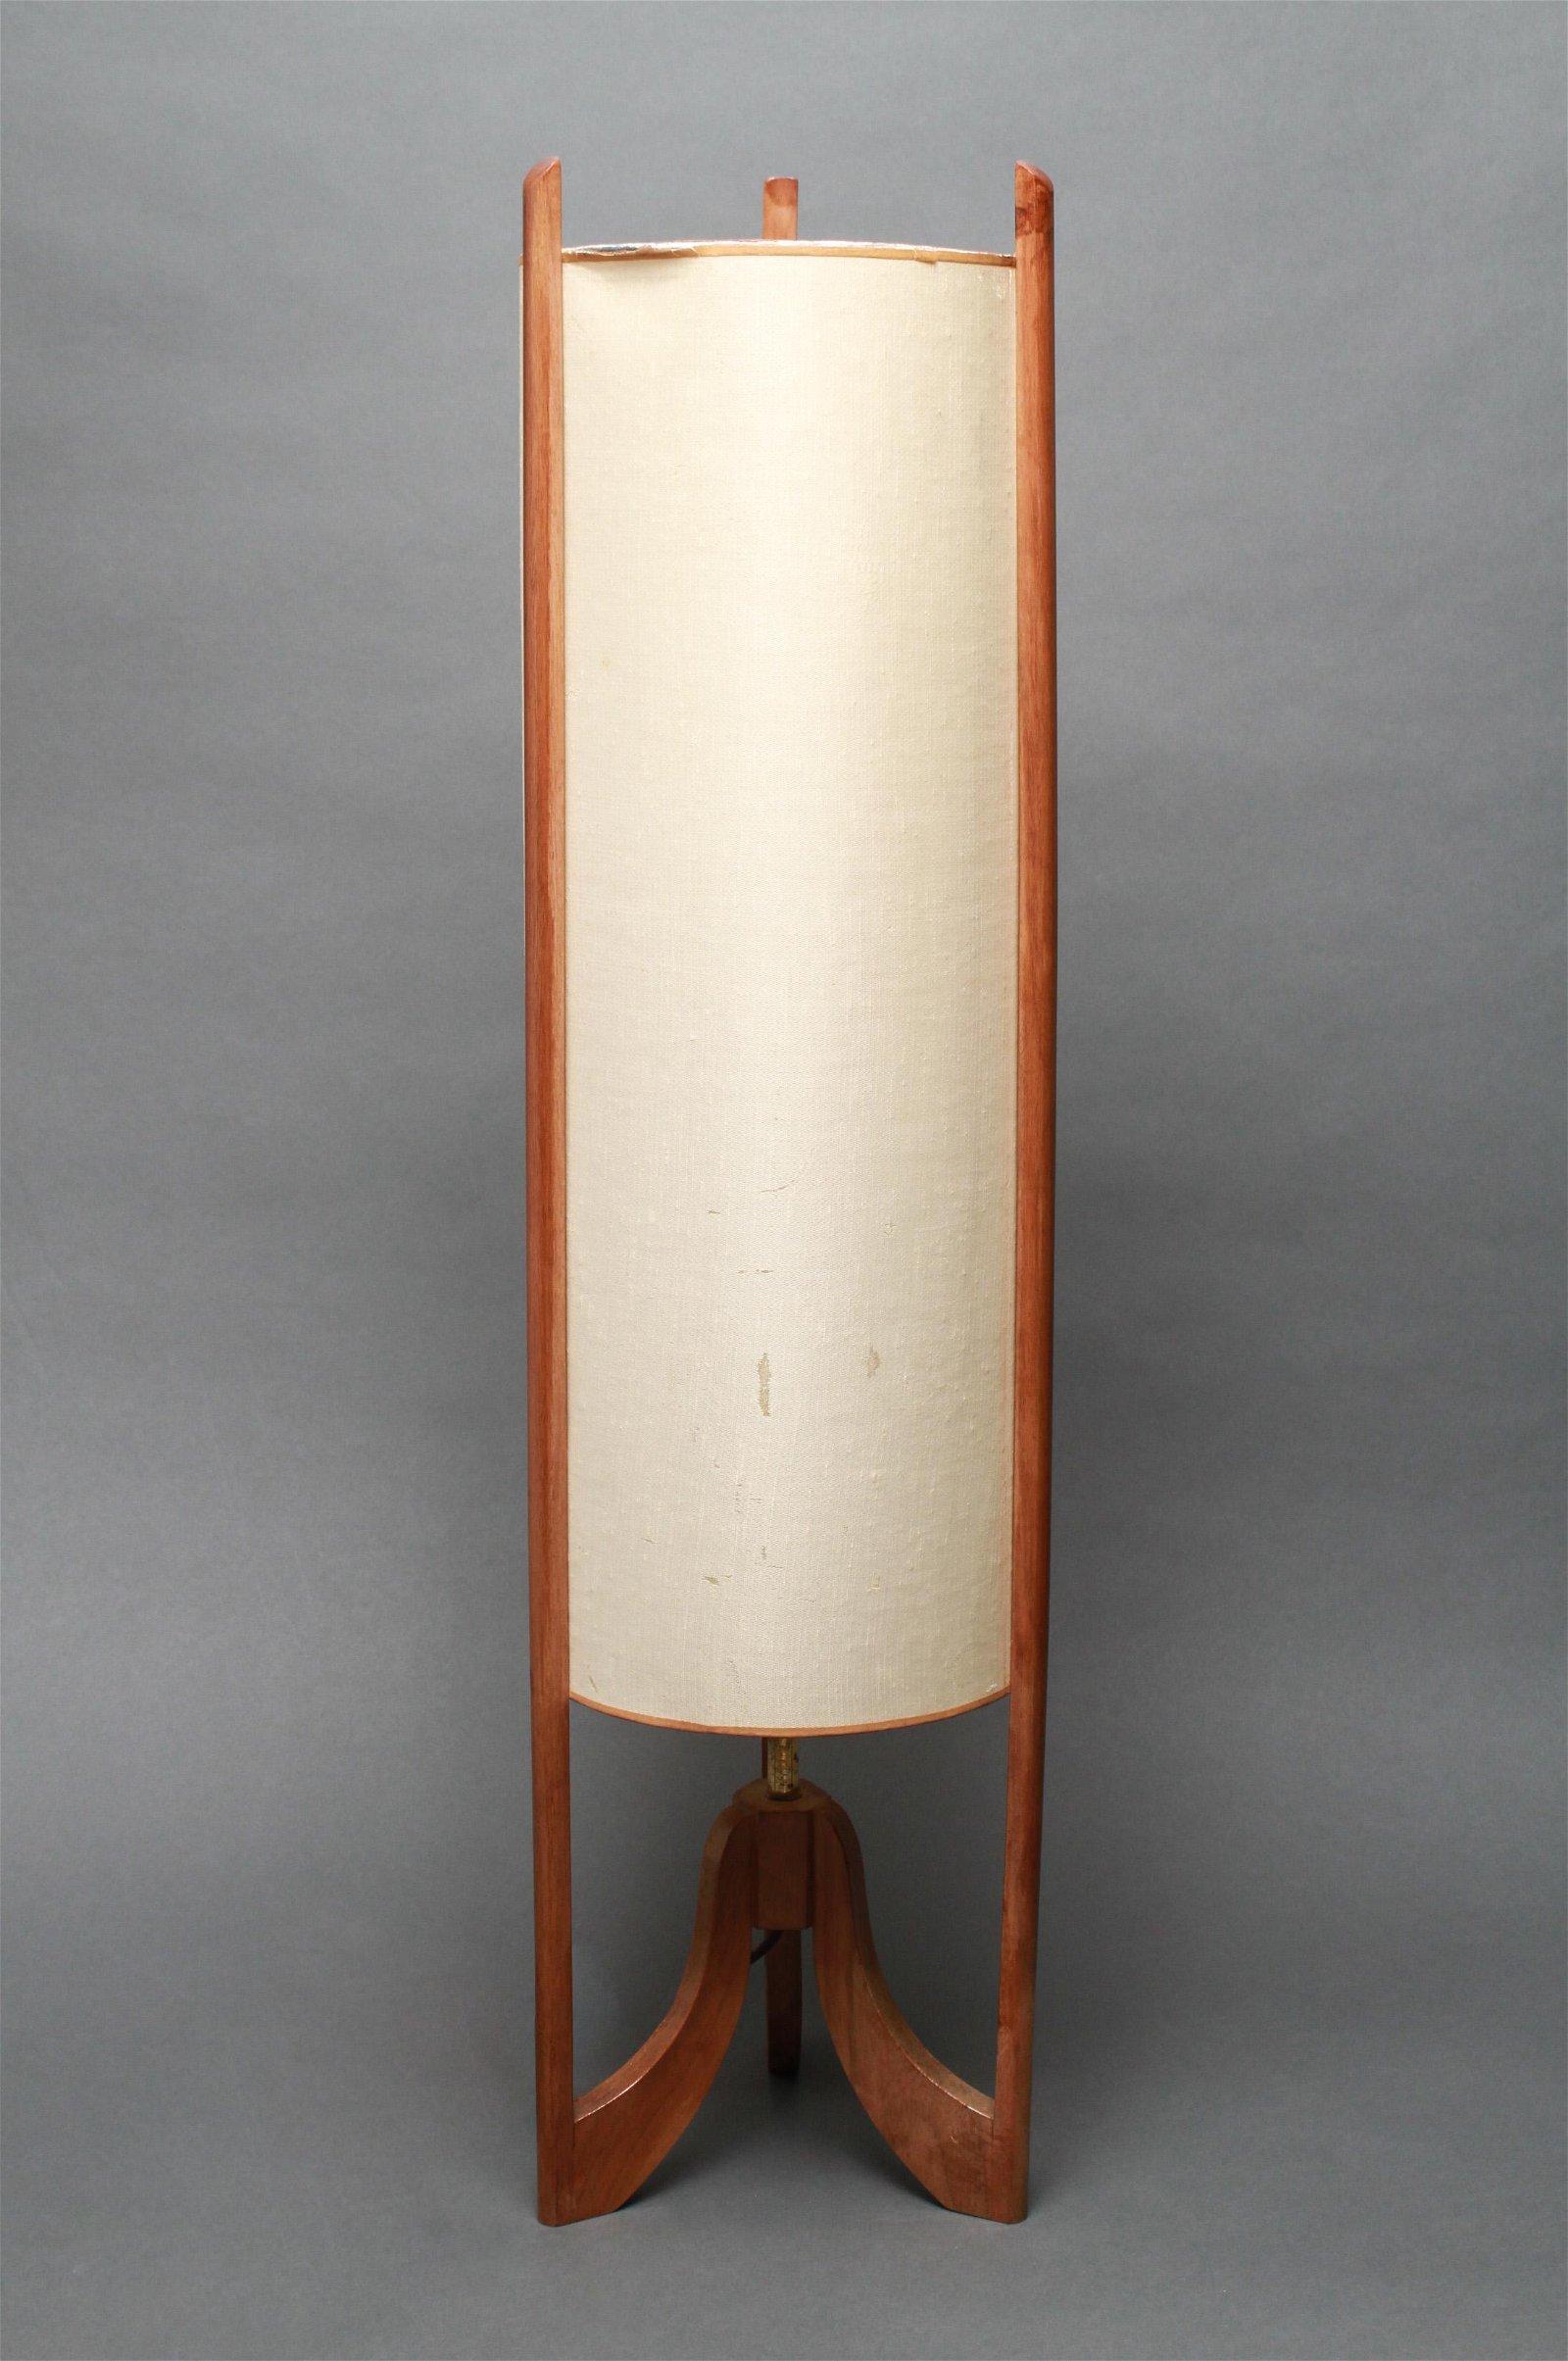 Modeline Style Mid-Century Modern Table Lamp